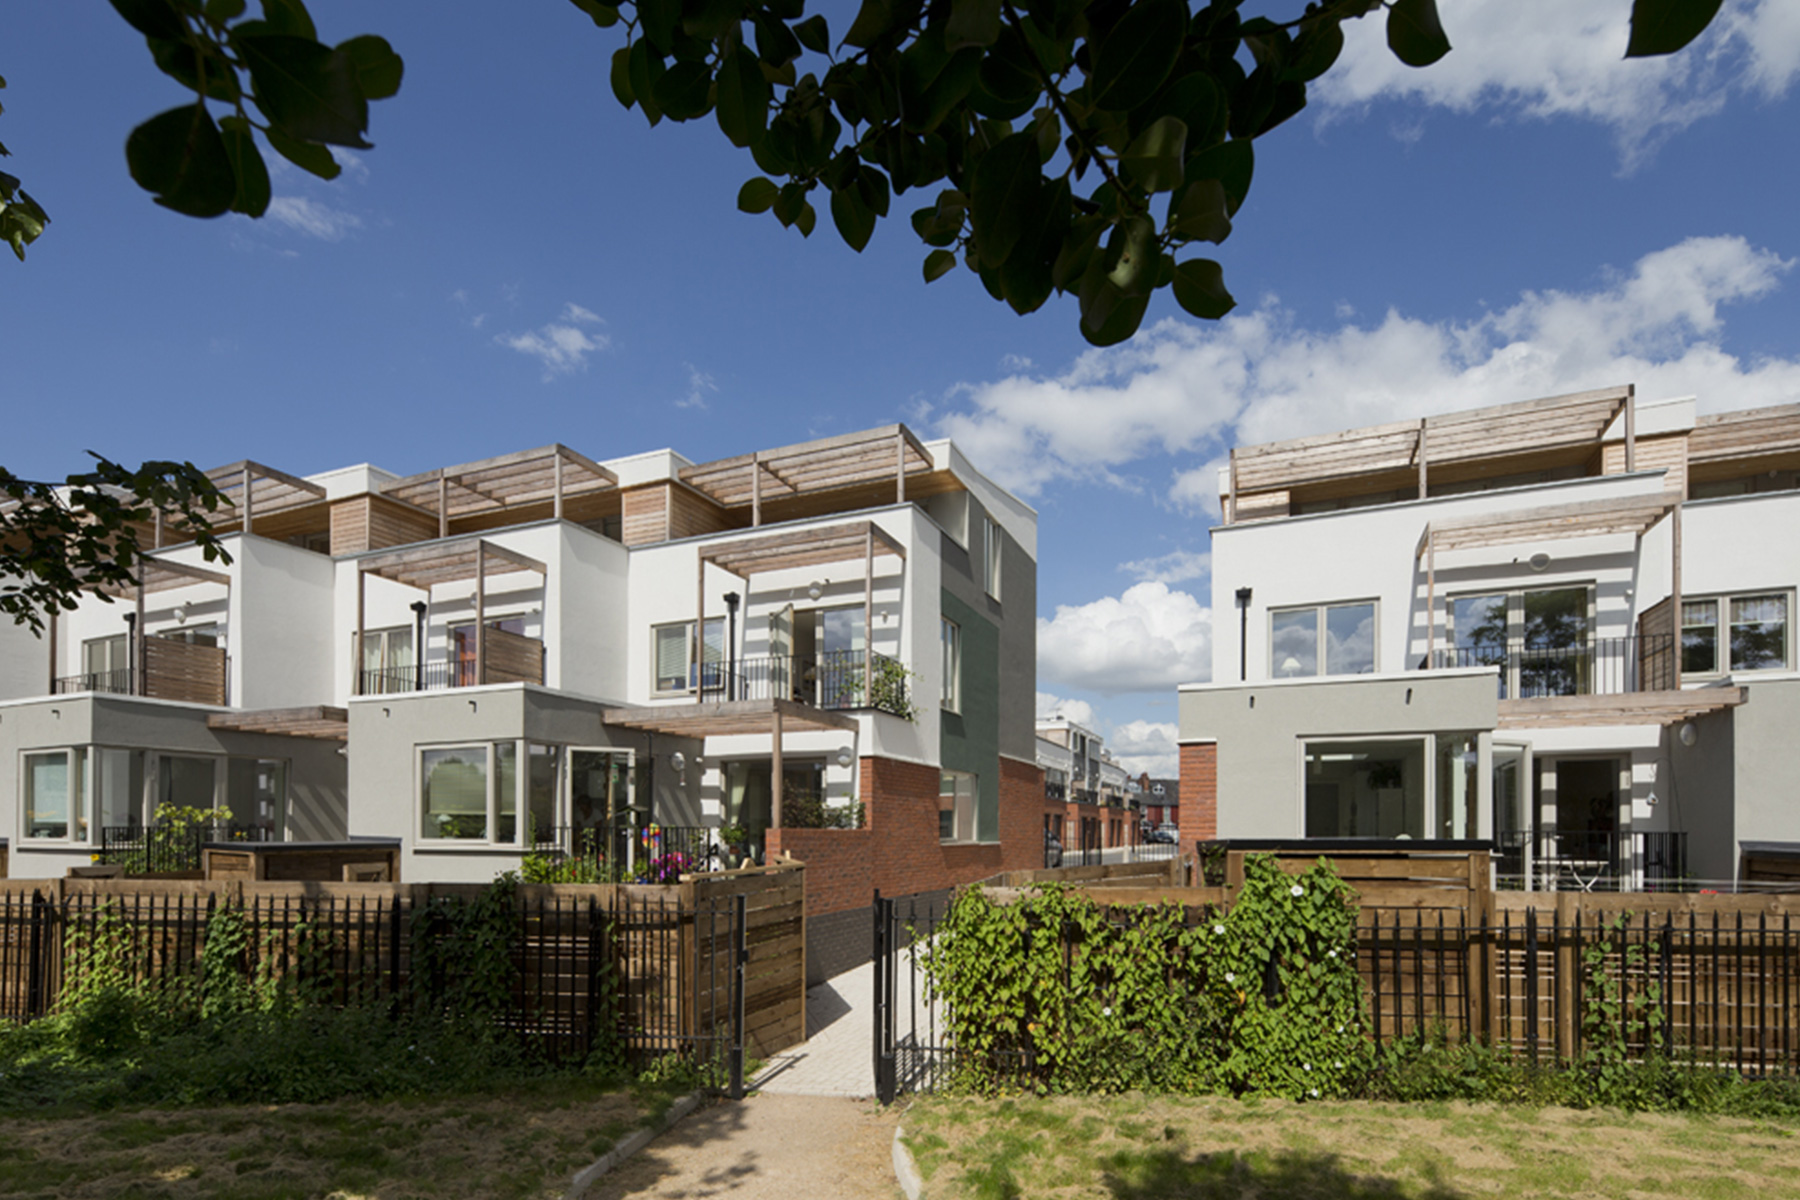 The_Meadows_housing_Nottingham_01